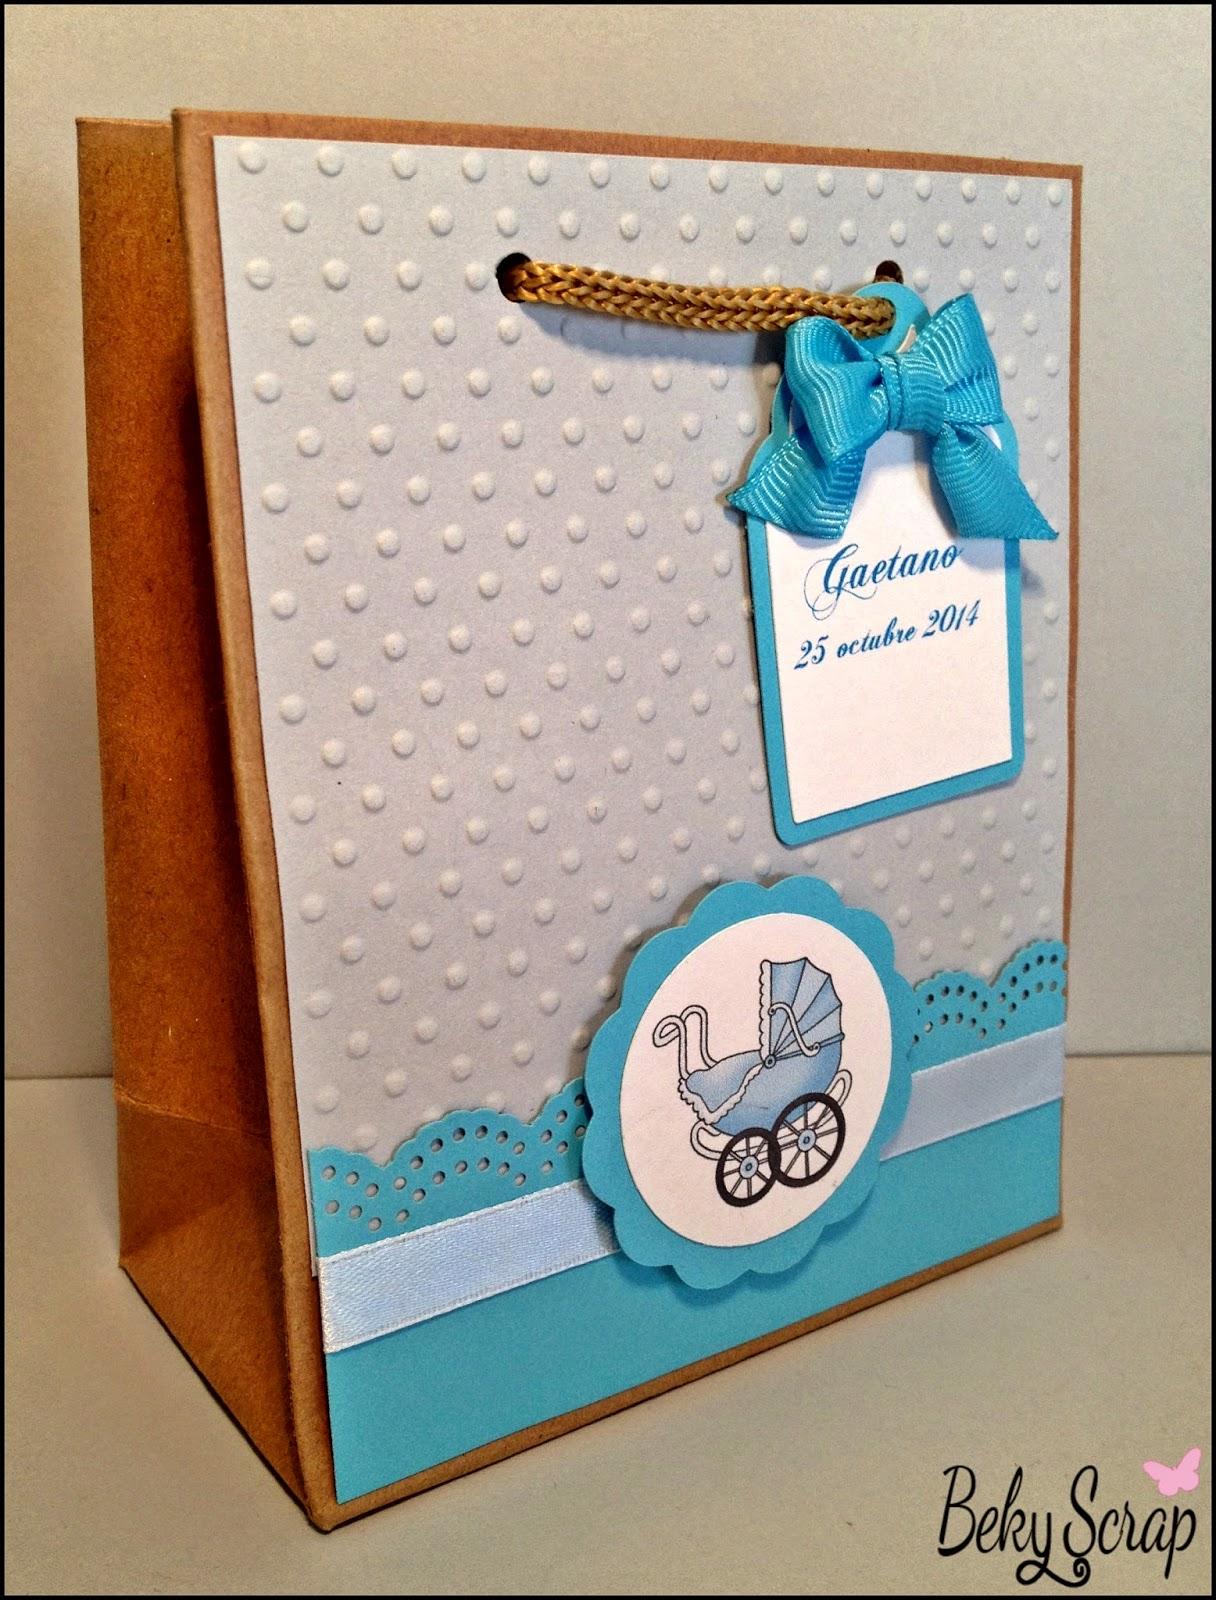 Beky scrap bolsas regalo personalizadas para el bautizo - Bolsas de regalo personalizadas ...